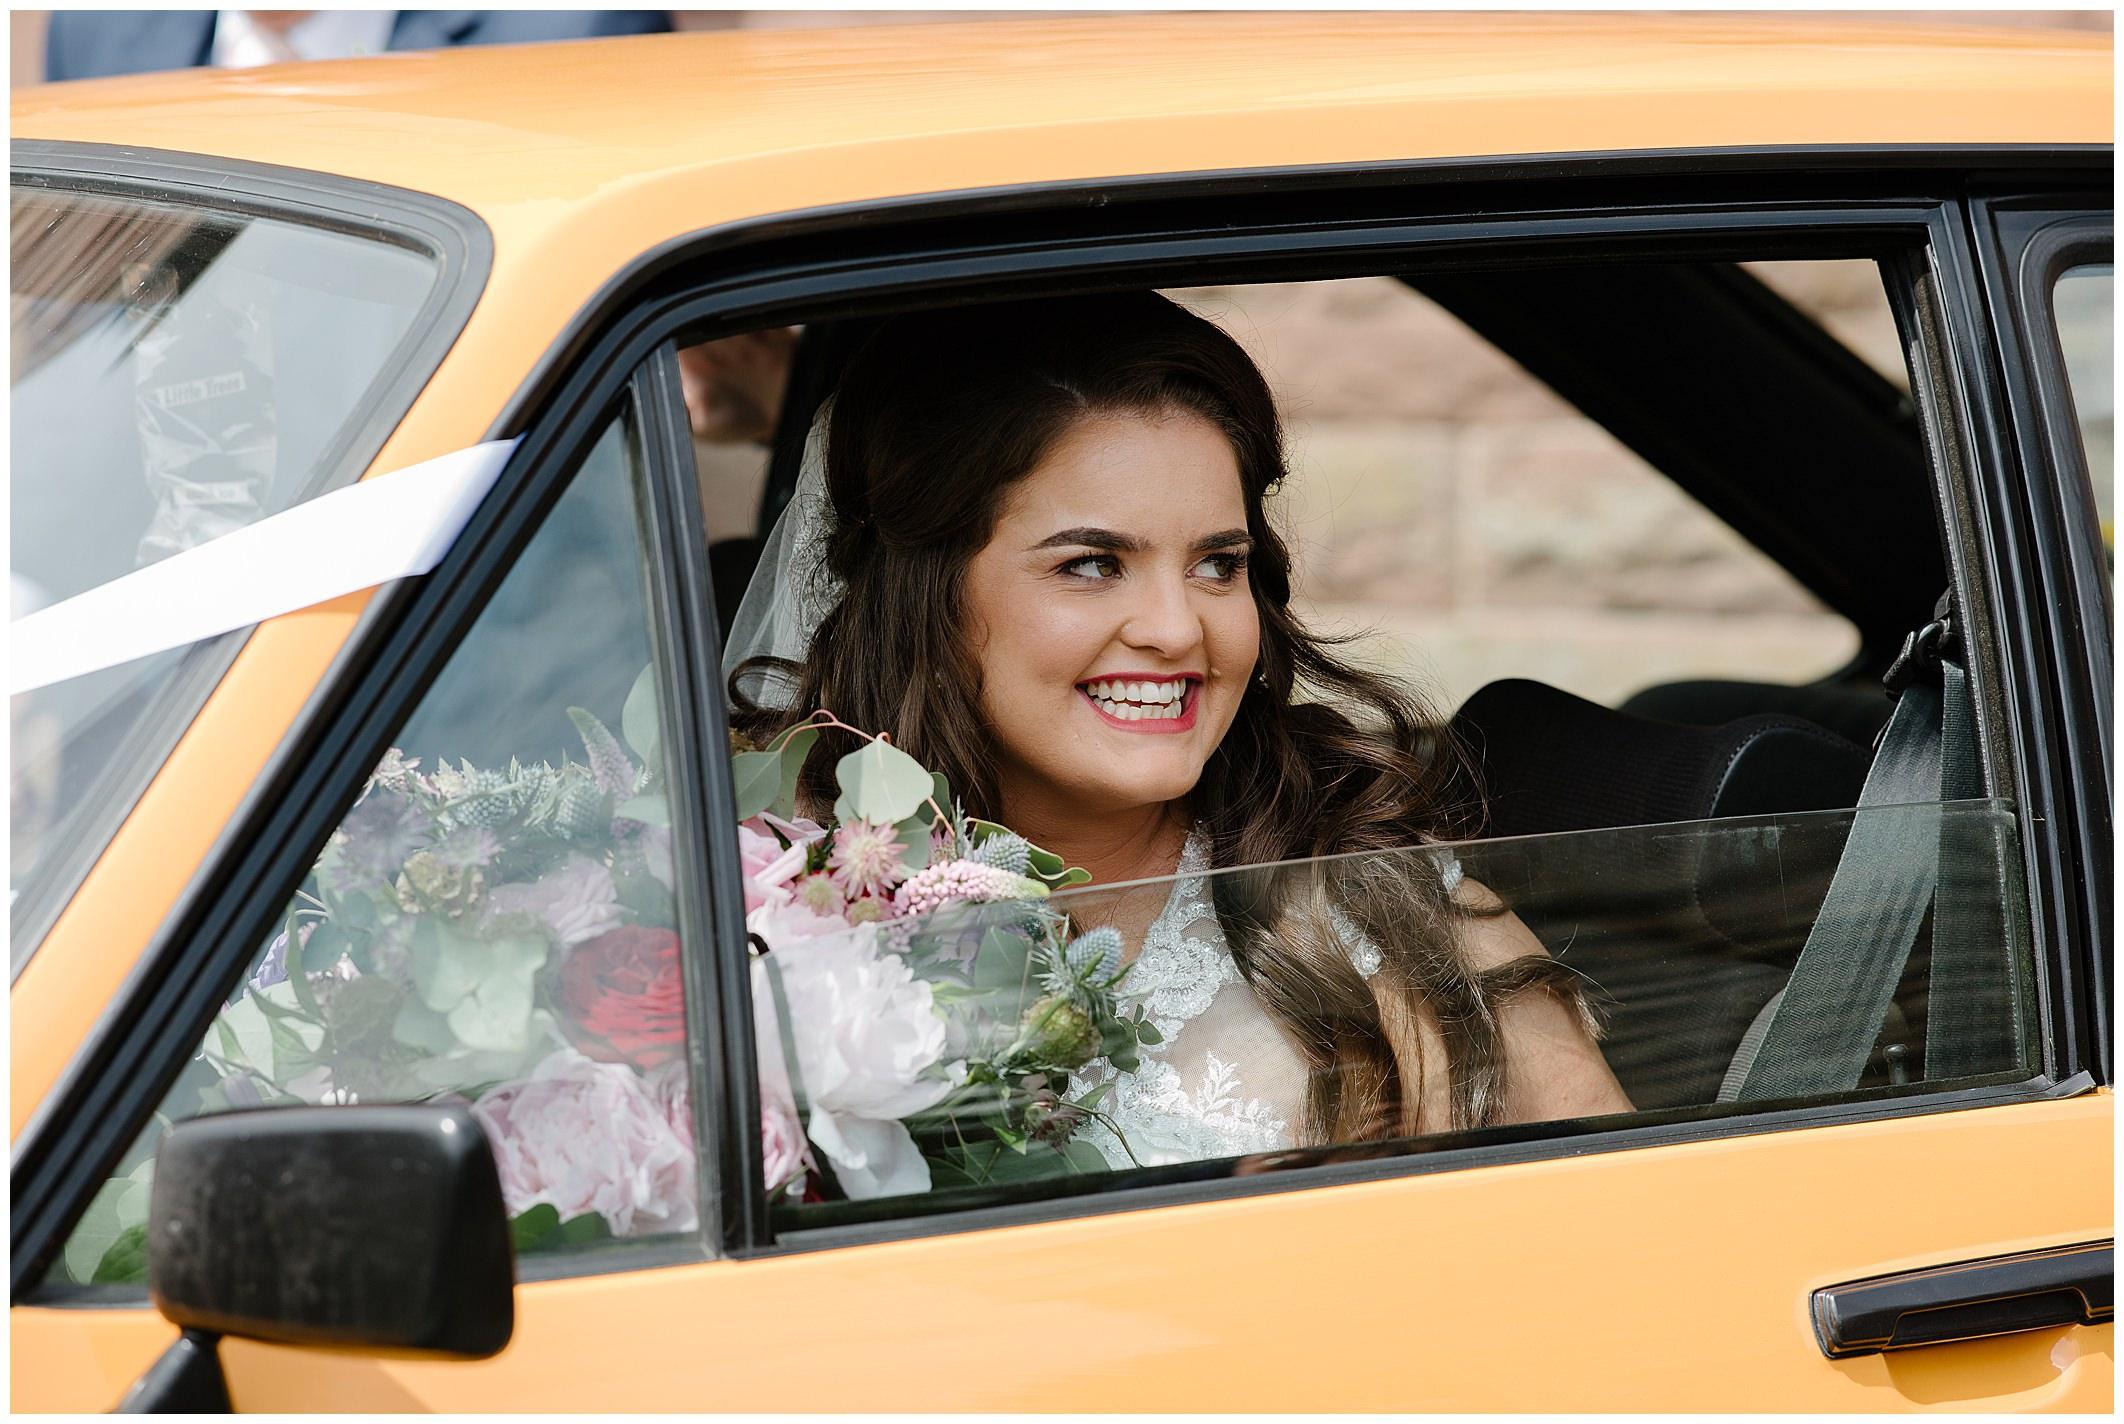 redcastle-hotel-wedding-karen-brian-jude-browne-photography-058.jpg